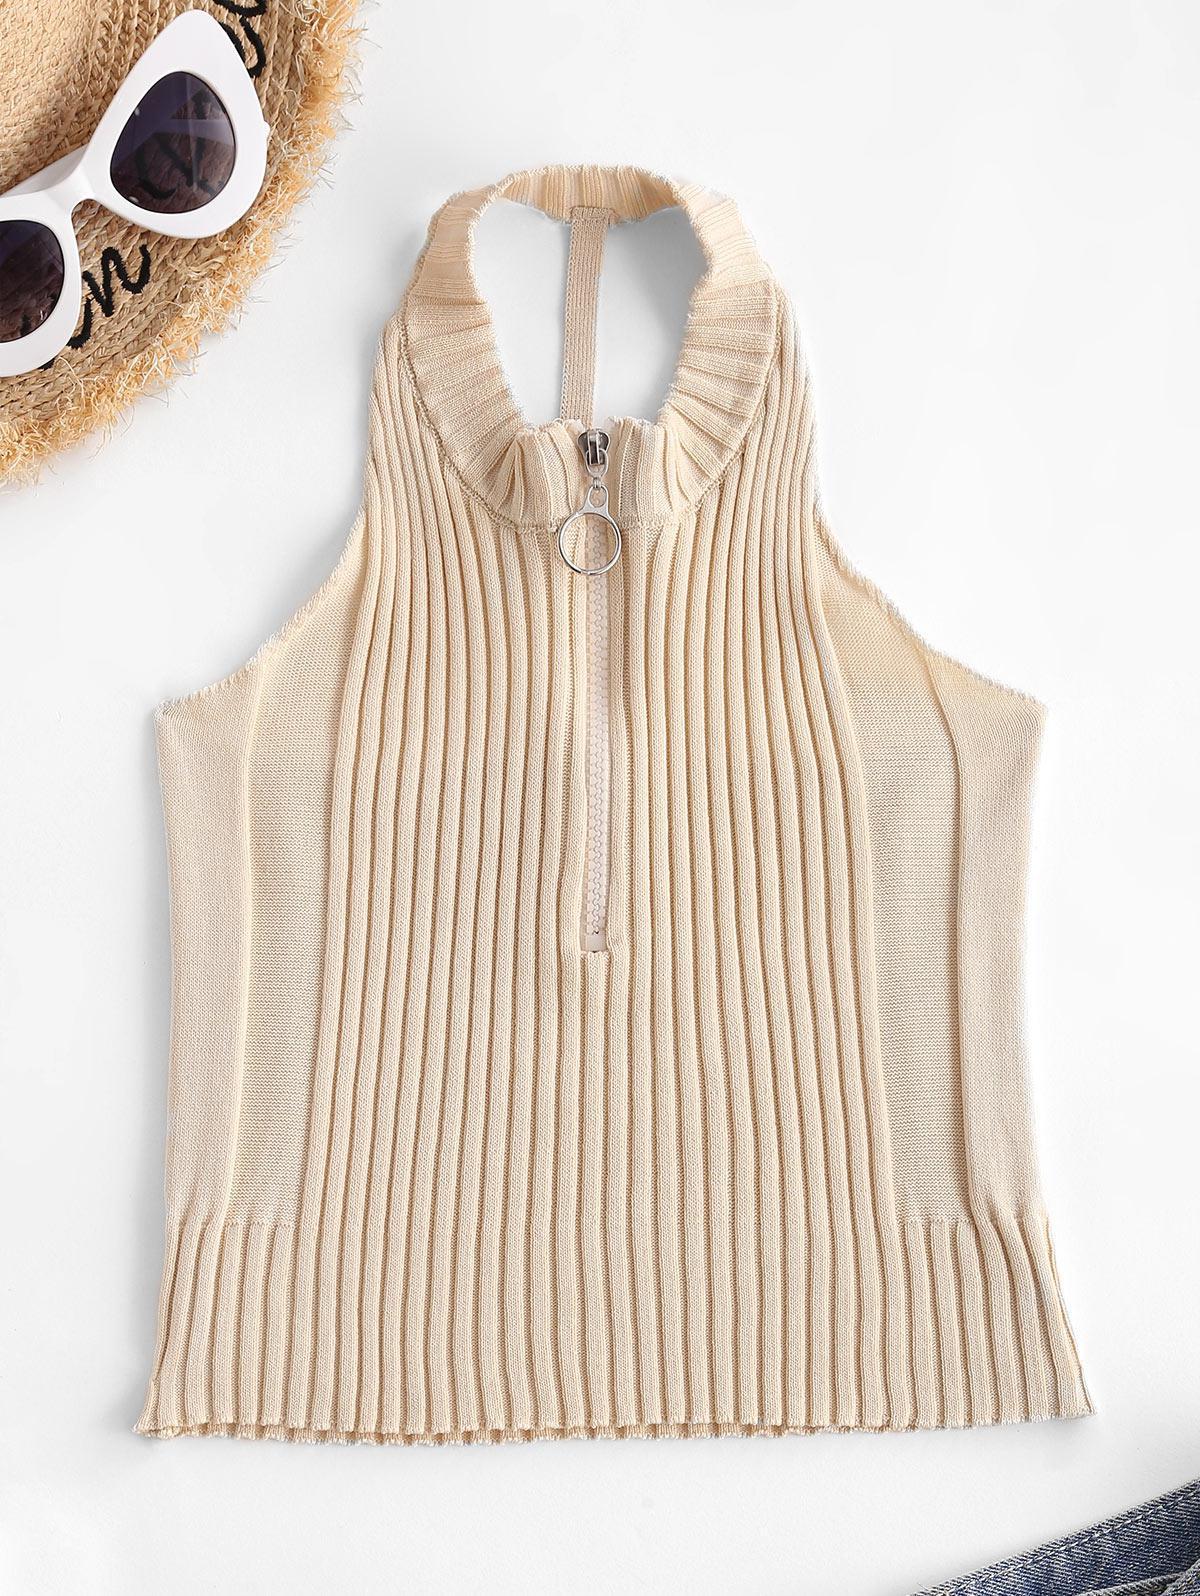 Pull Ring Zip Cutout Crop Knit Tank Top